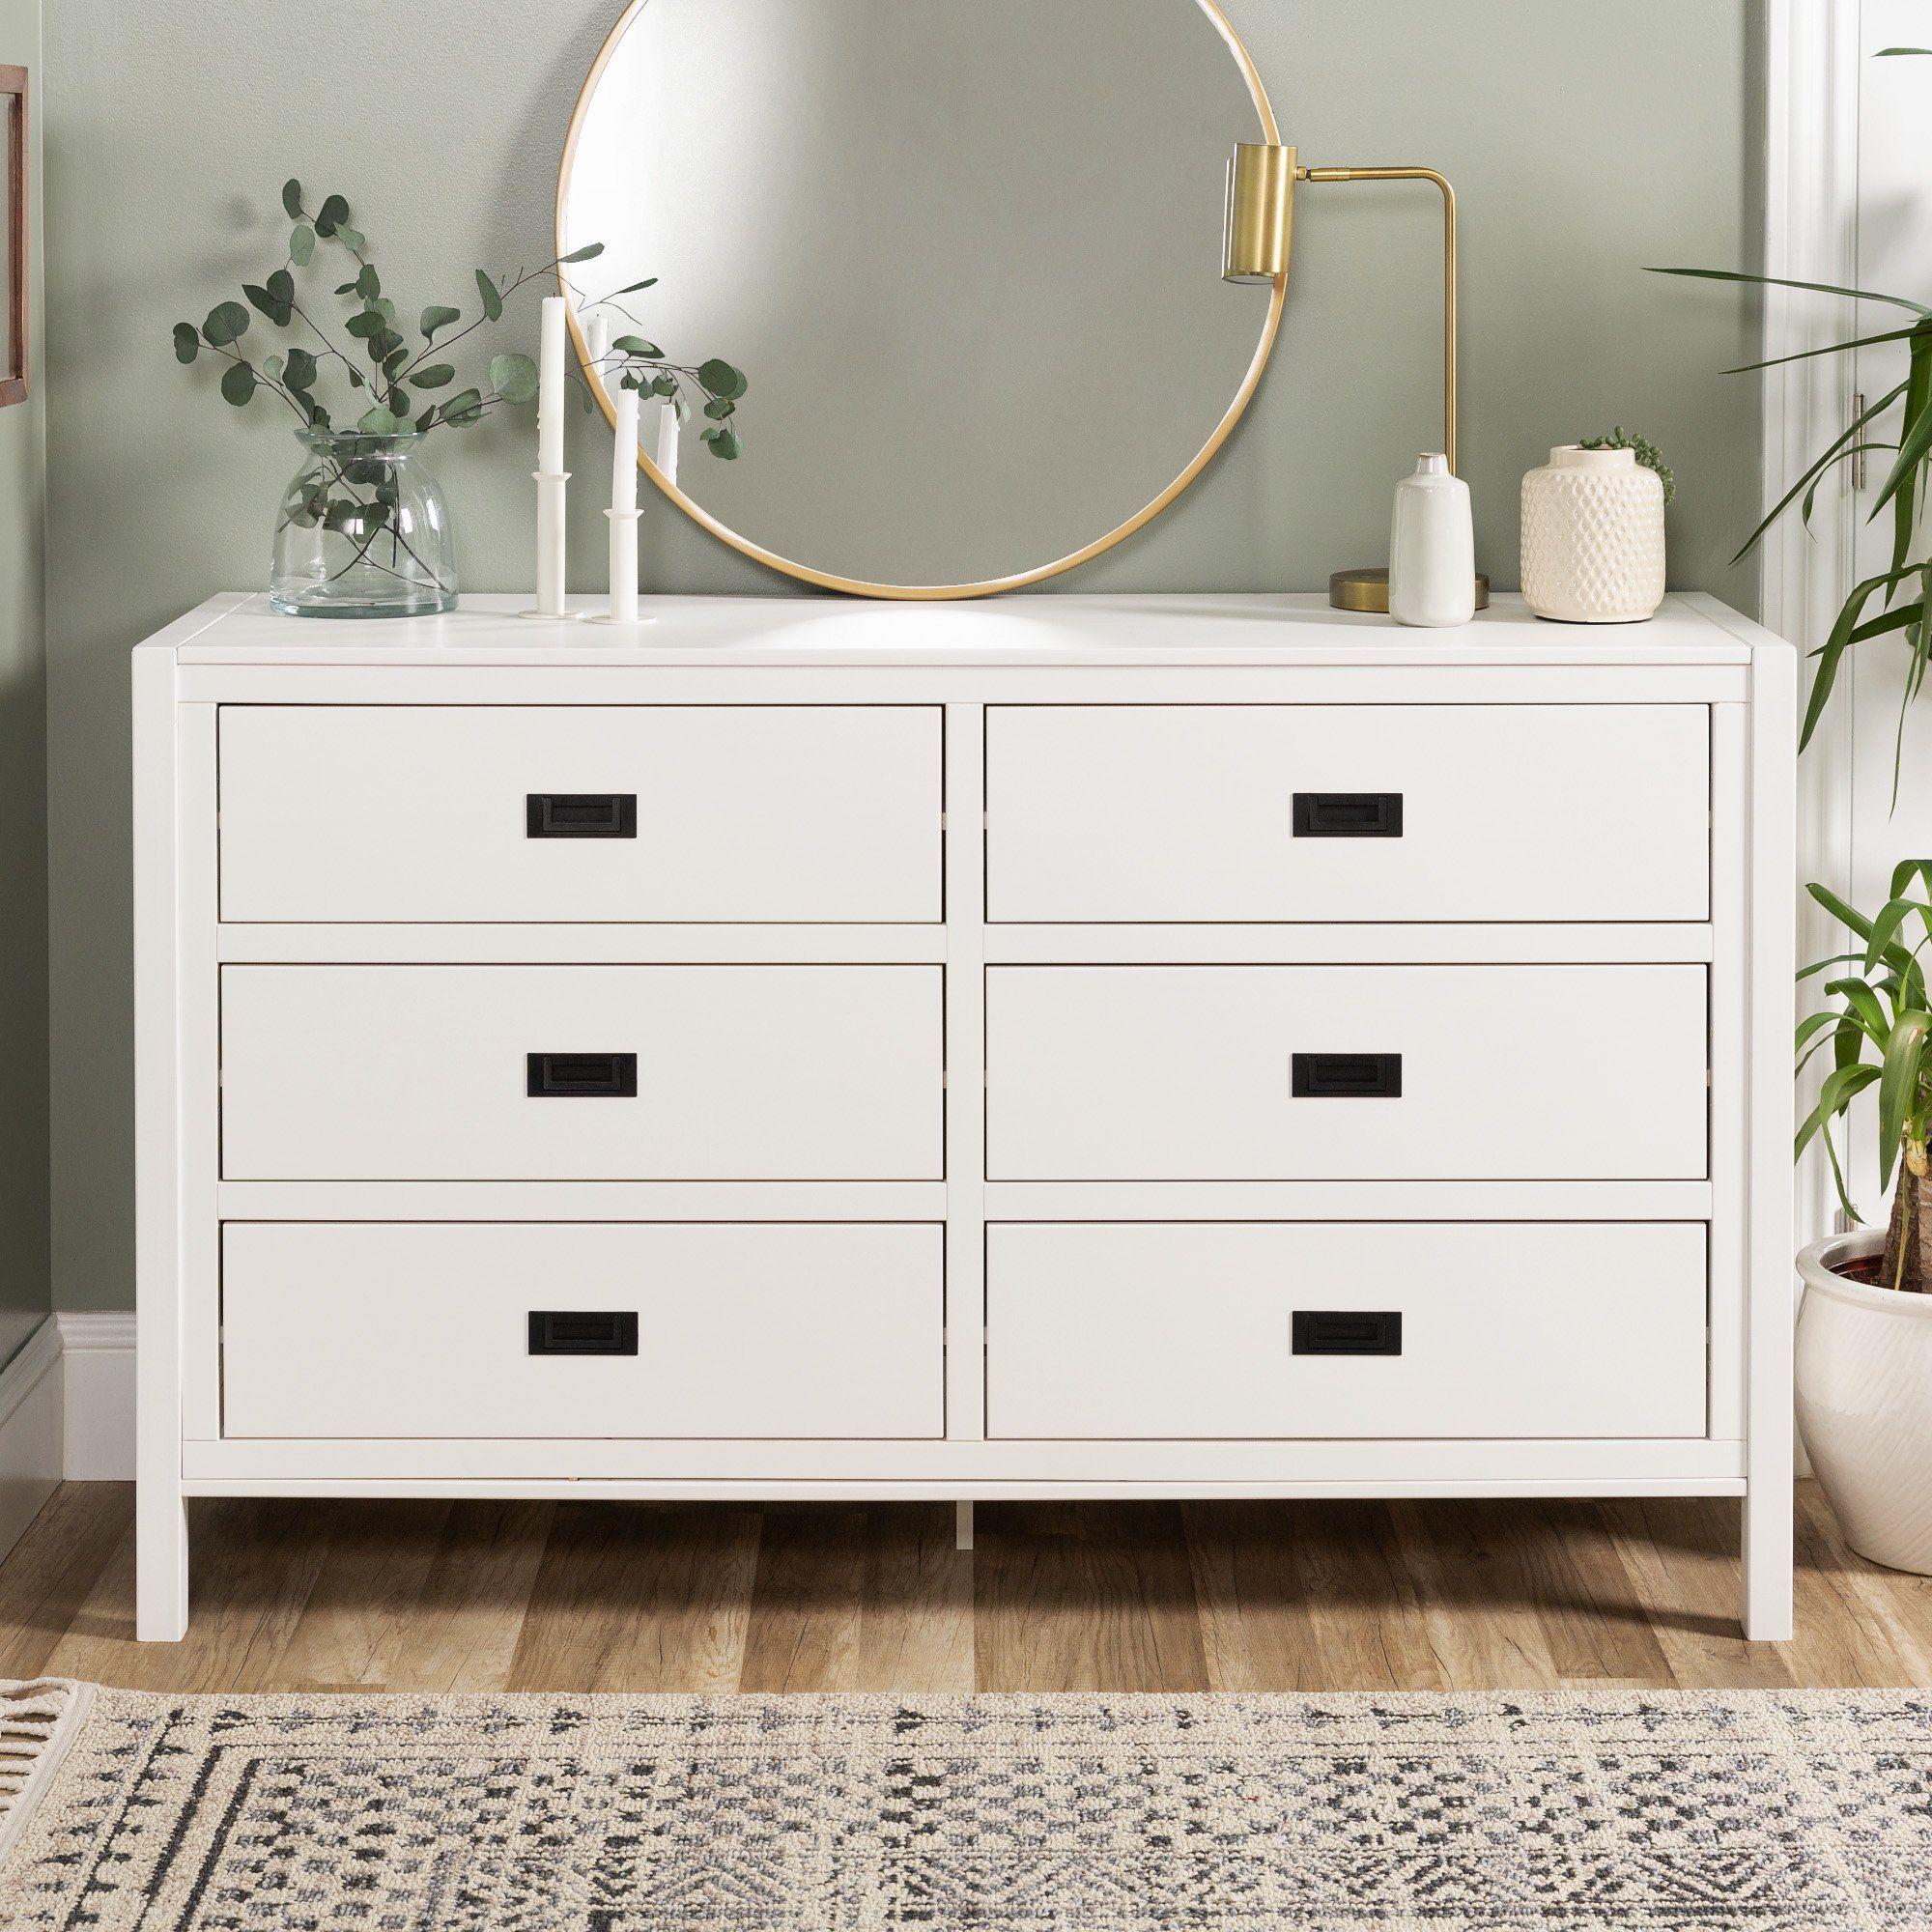 Annabelle Six Drawer Solid Wood White Dresser By Chateau Lyon Walmart Com In 2021 Dresser Decor Bedroom White Dresser White Dresser Decor [ 2000 x 2000 Pixel ]